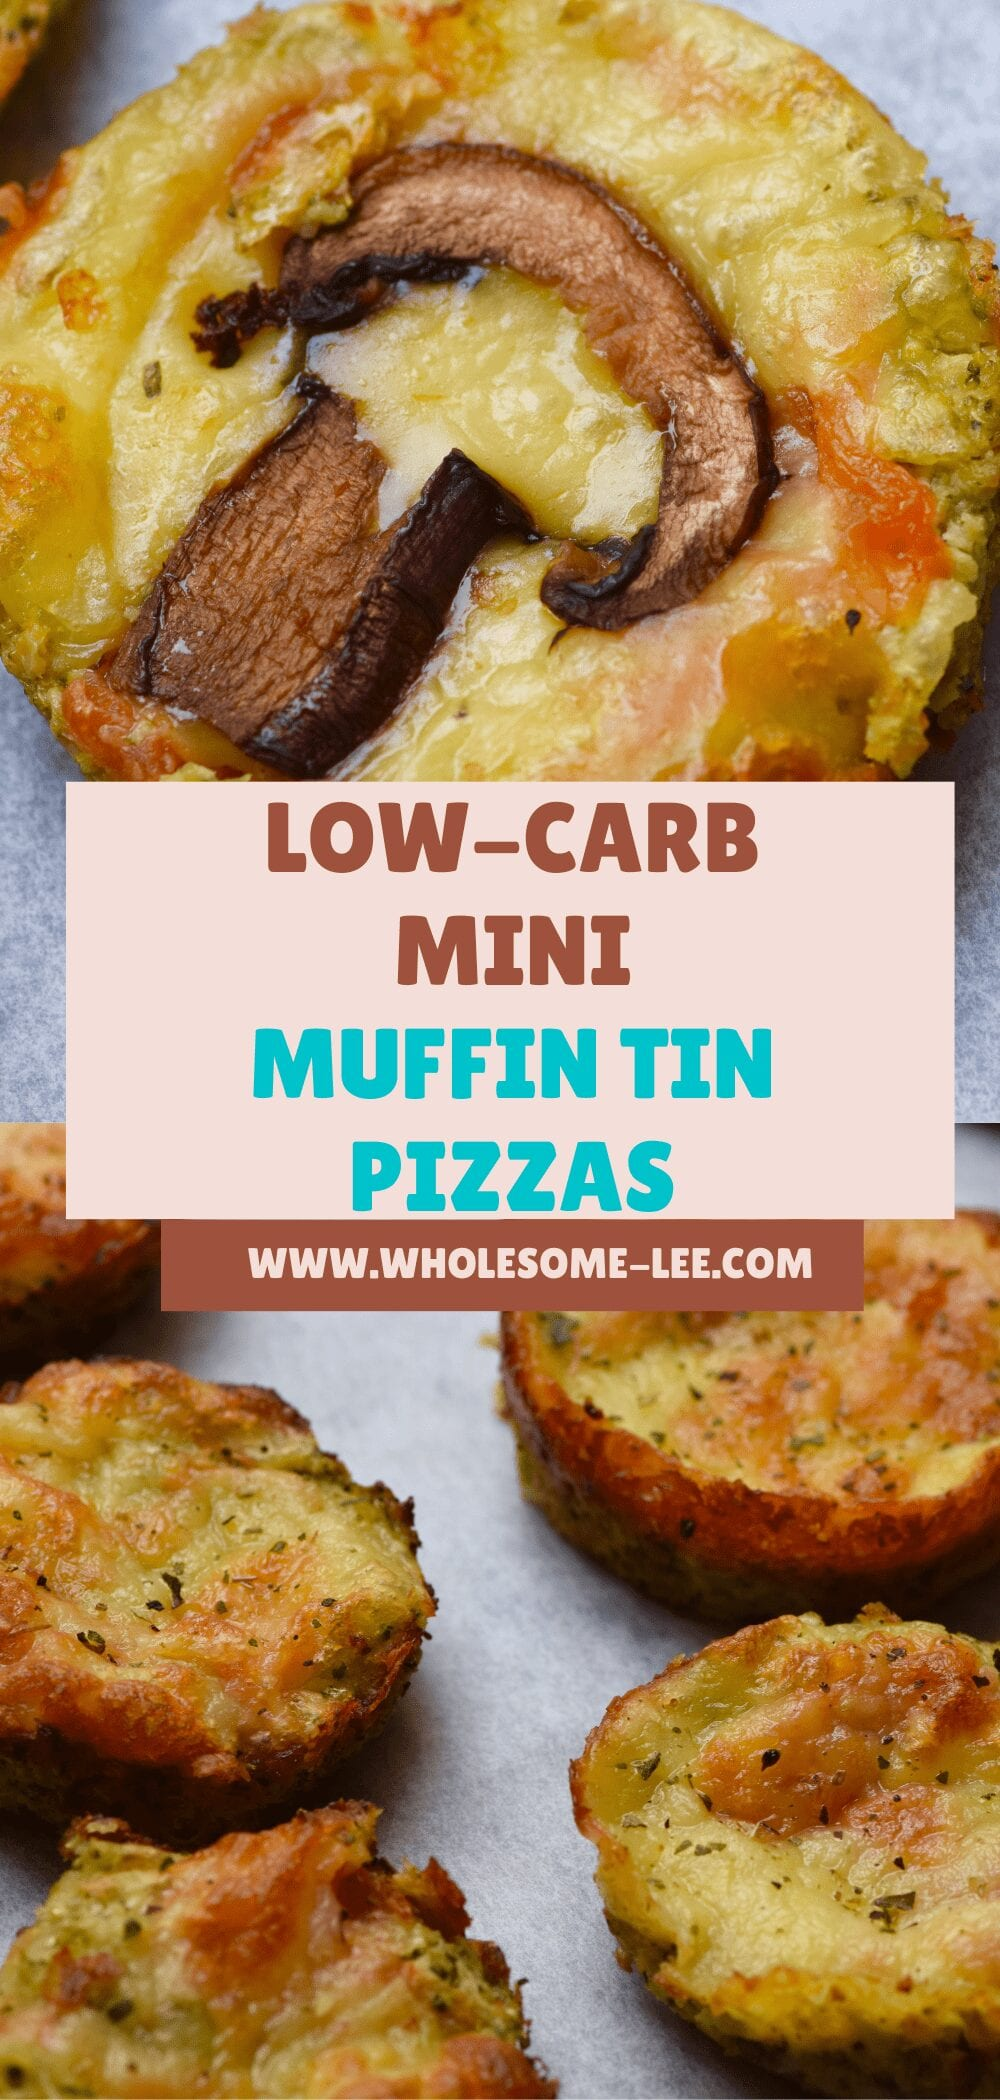 Low carb mini muffin tin pizzas